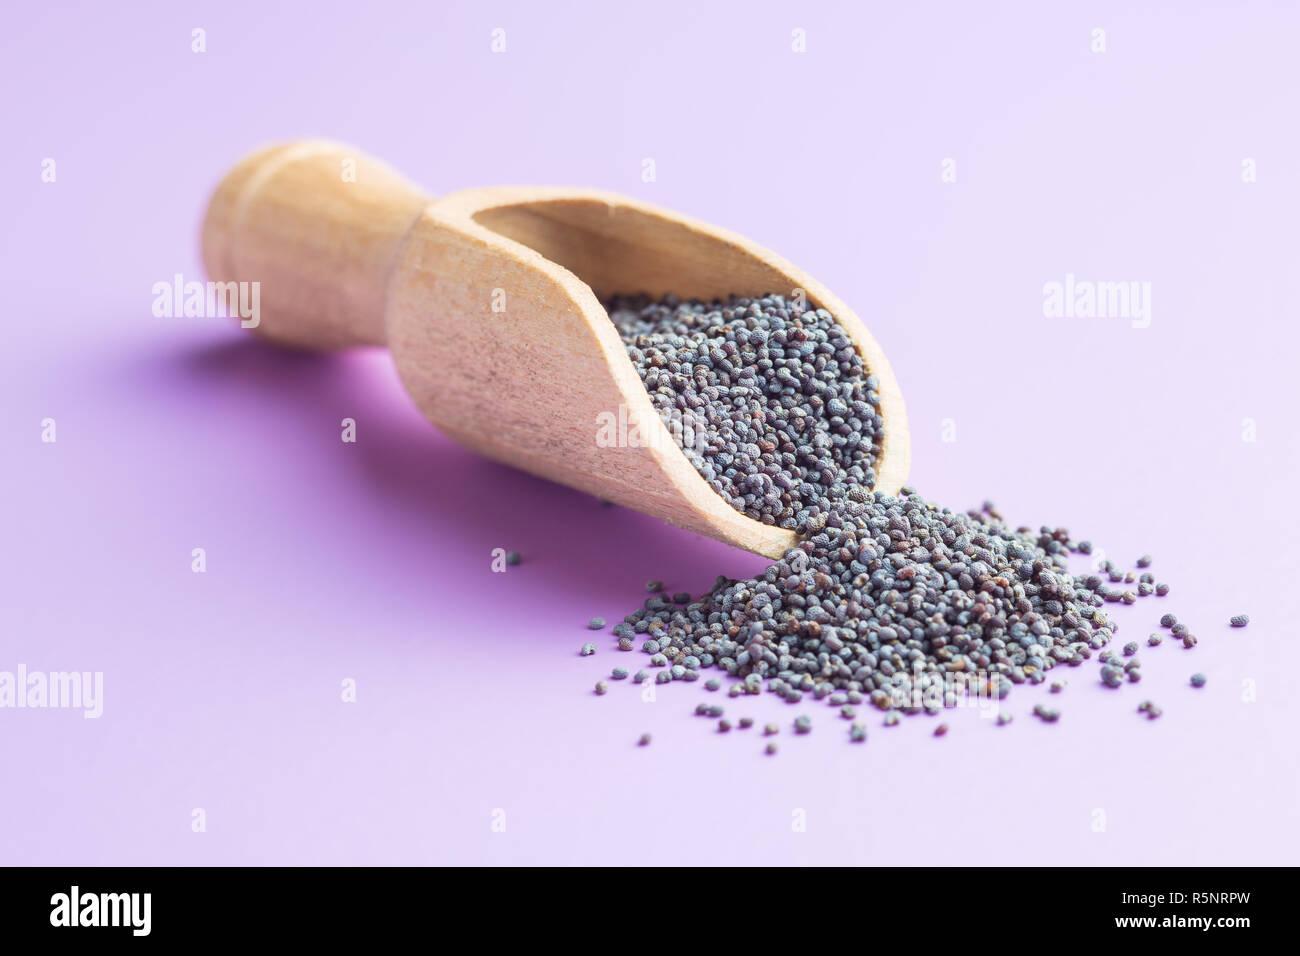 Blue poppy seeds. - Stock Image